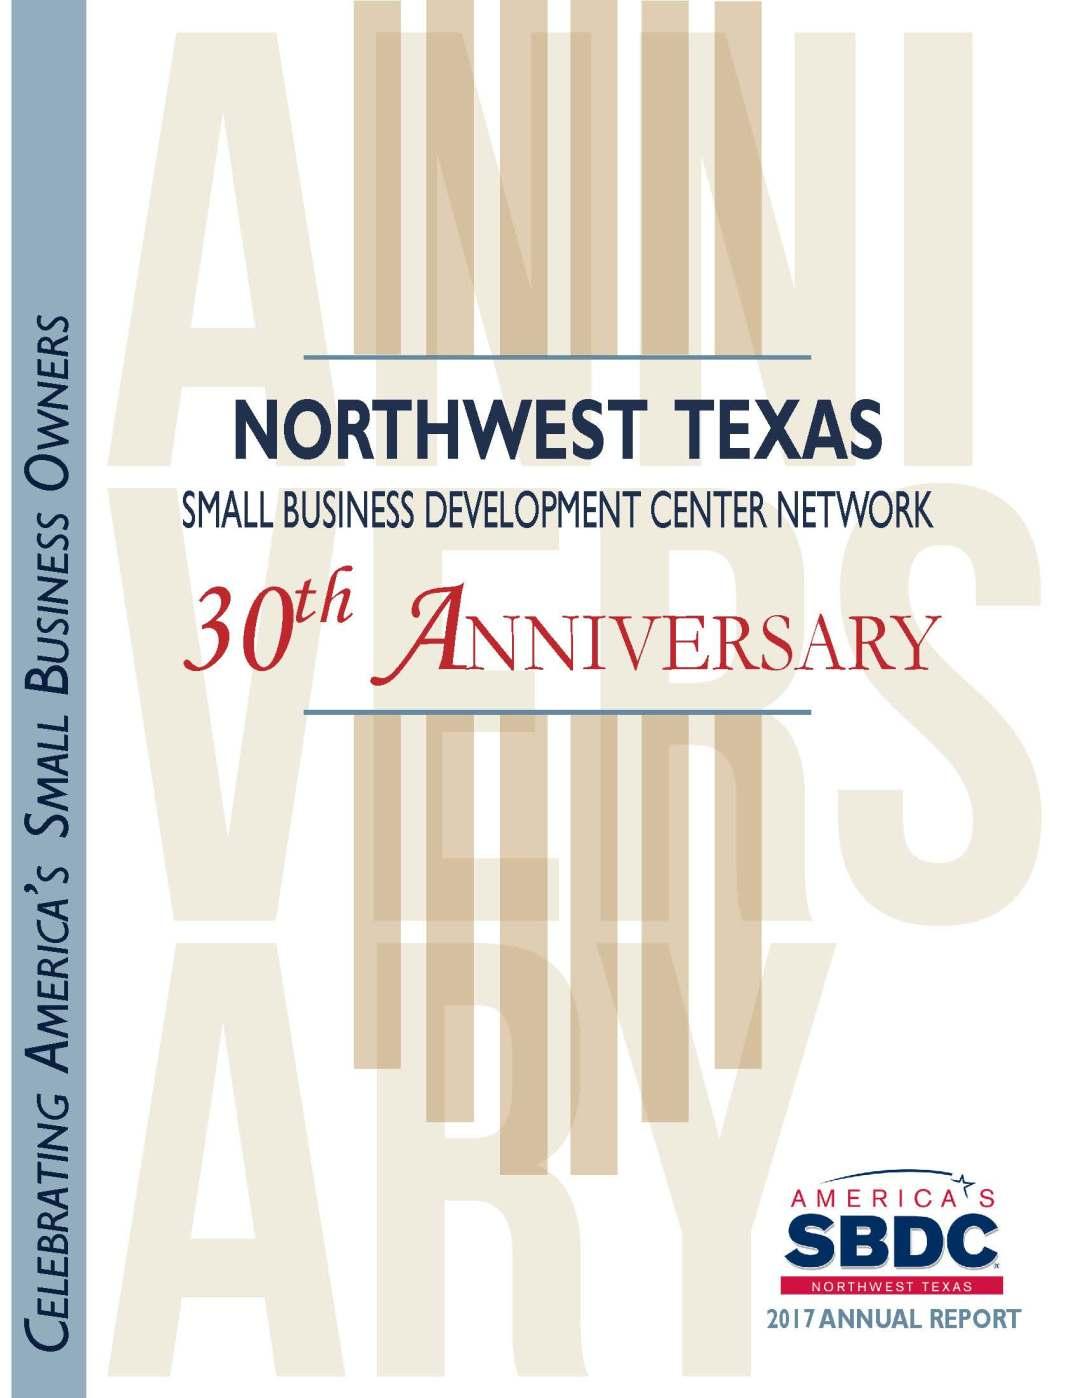 Northwest Texas Small Business Development Center 2017 Annual Report